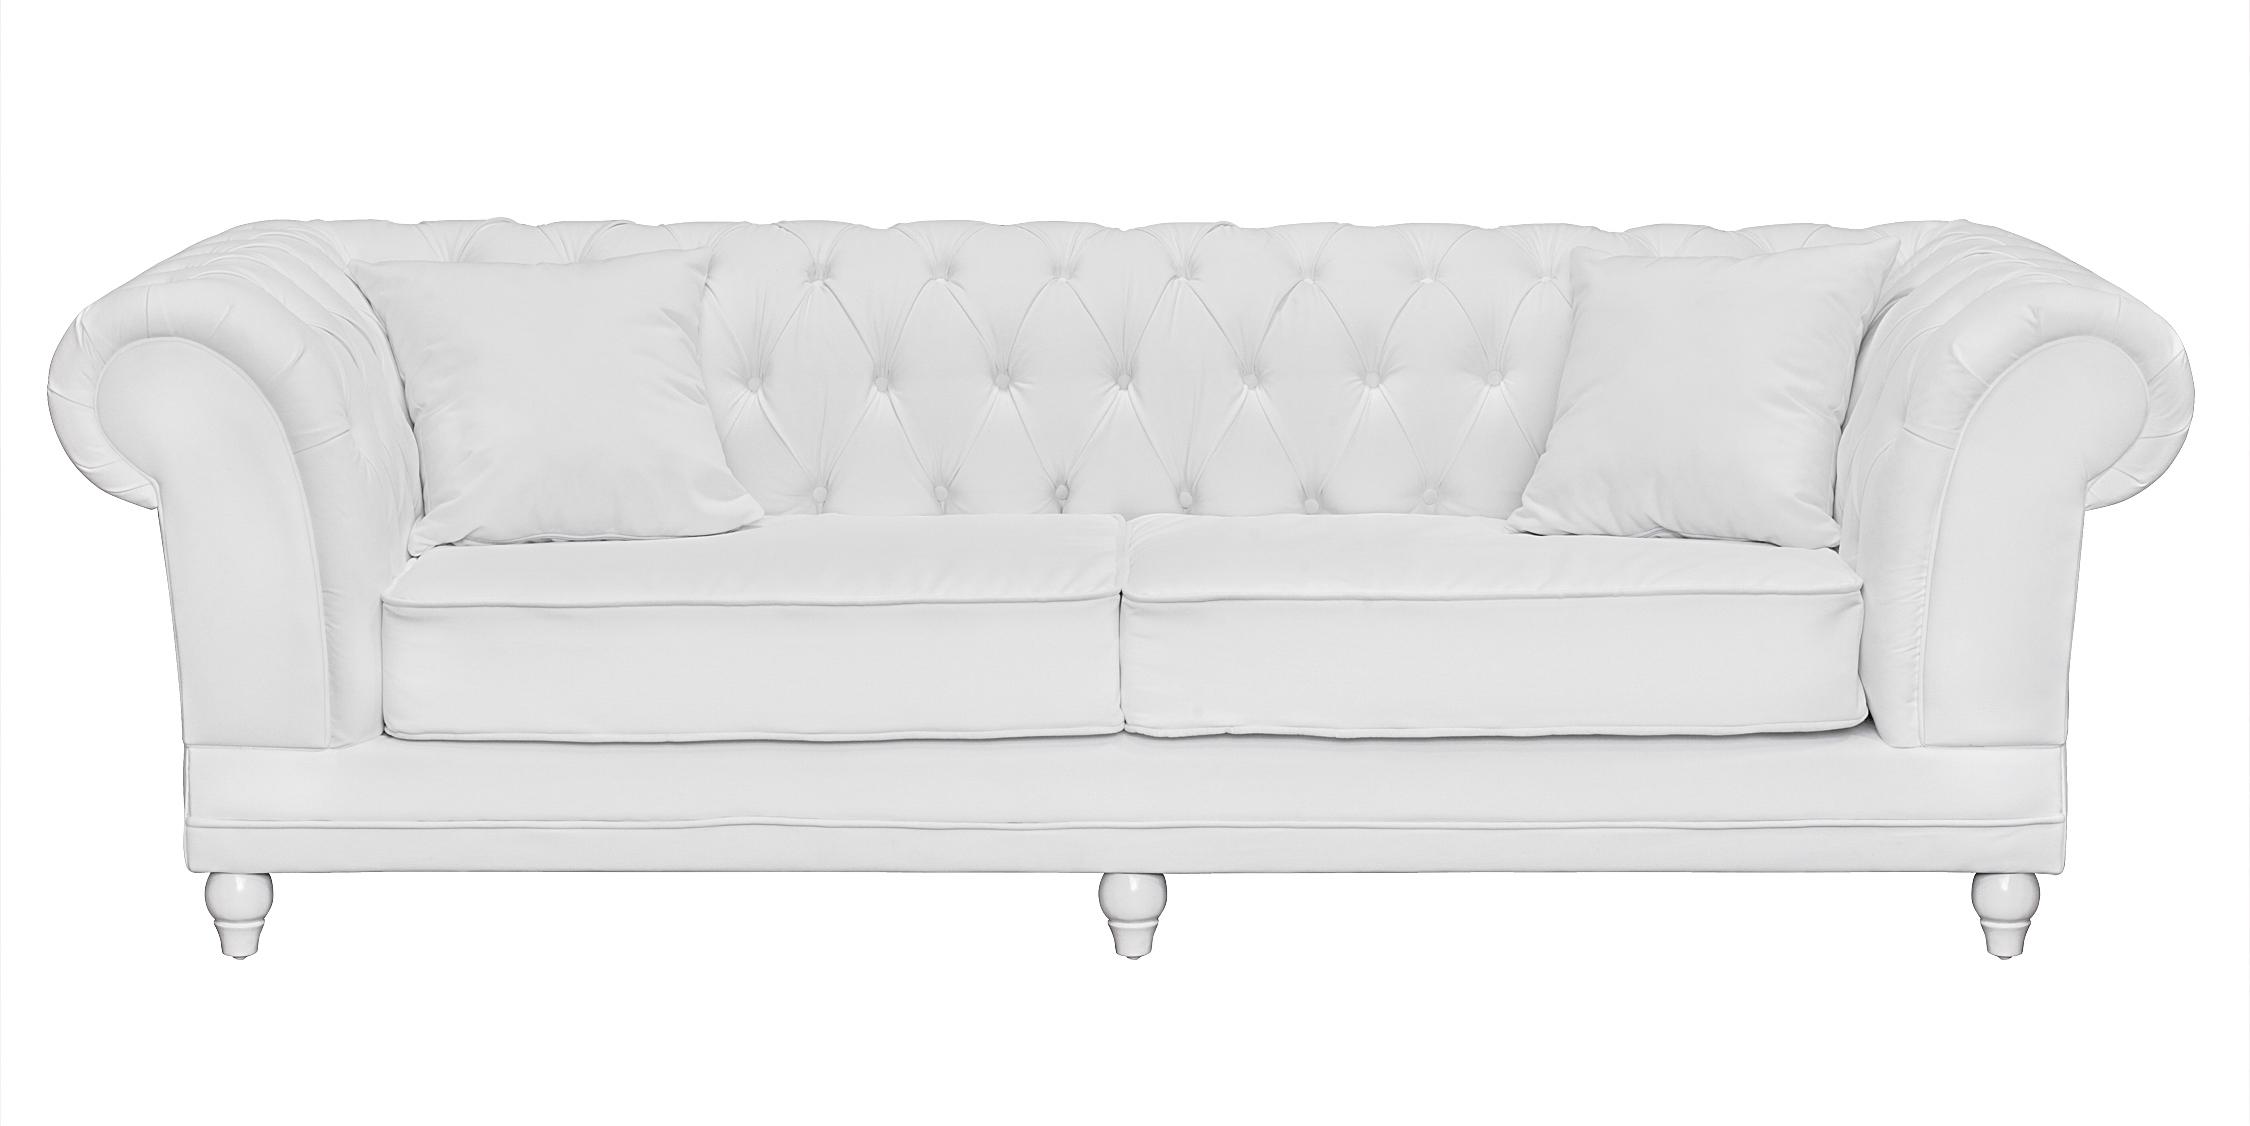 Mak-interior диван neylan белый 133577/7